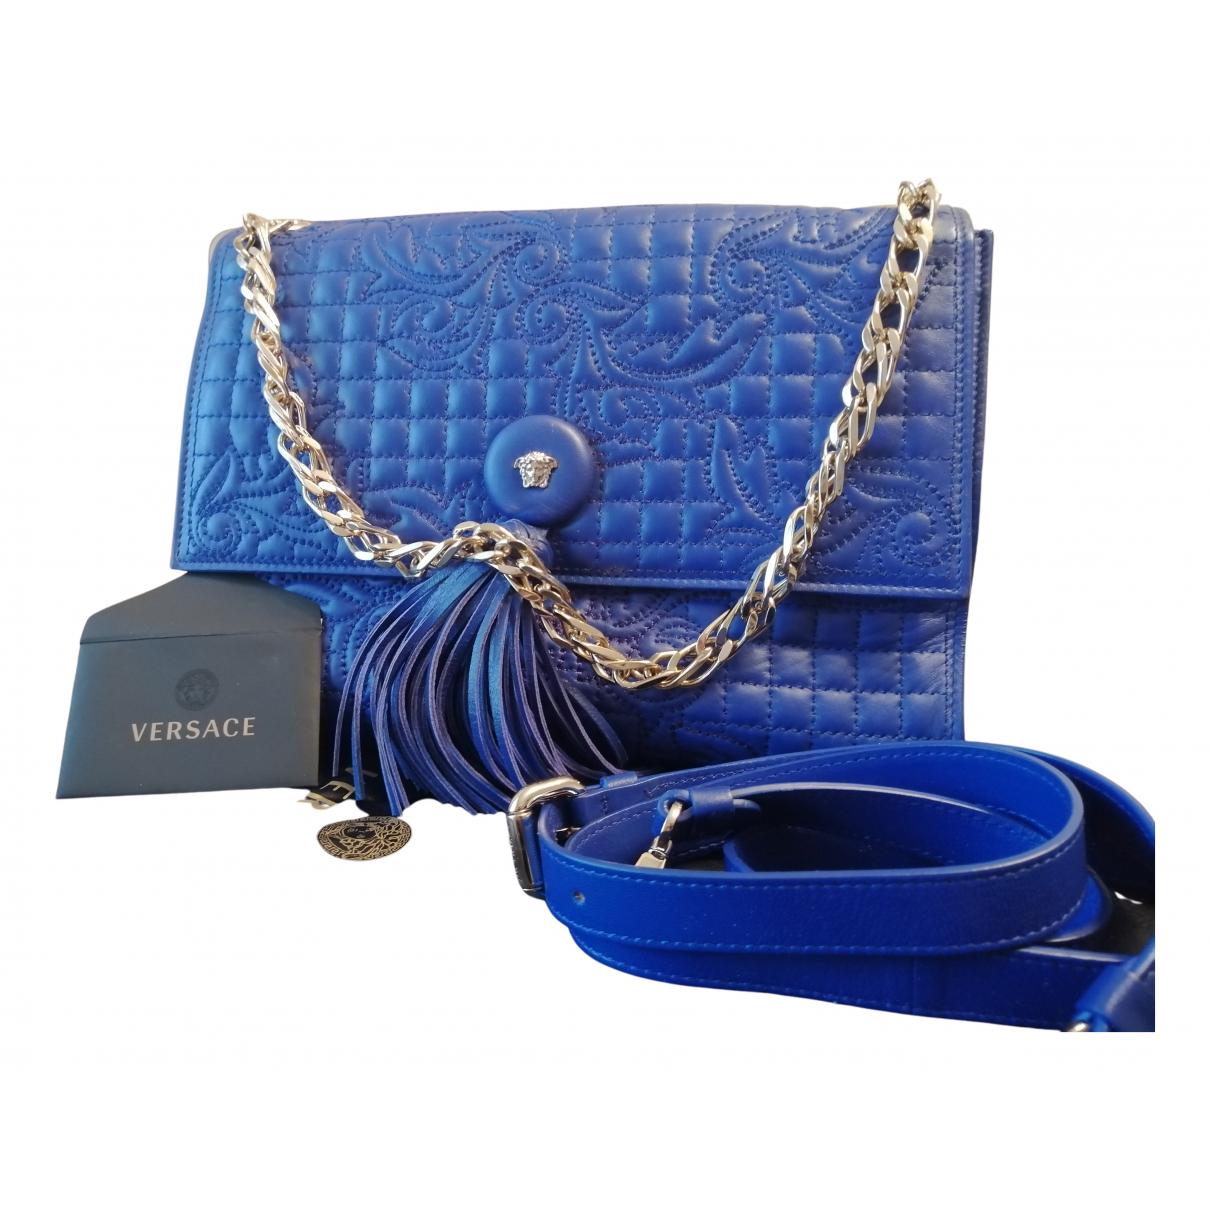 Gianni Versace \N Clutch in  Blau Leder